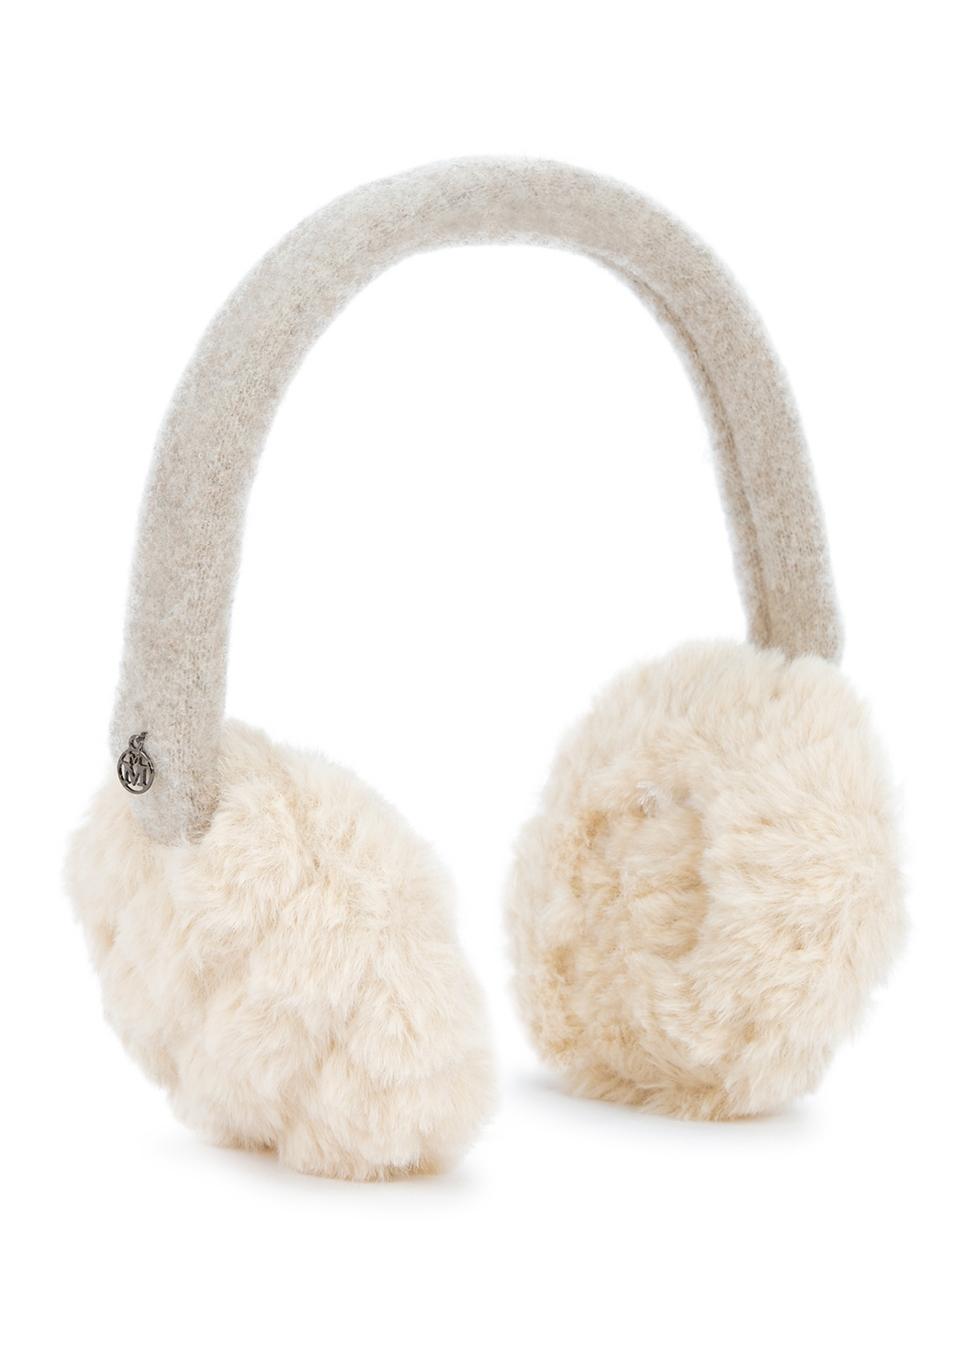 Morgana ivory faux fur ear muffs